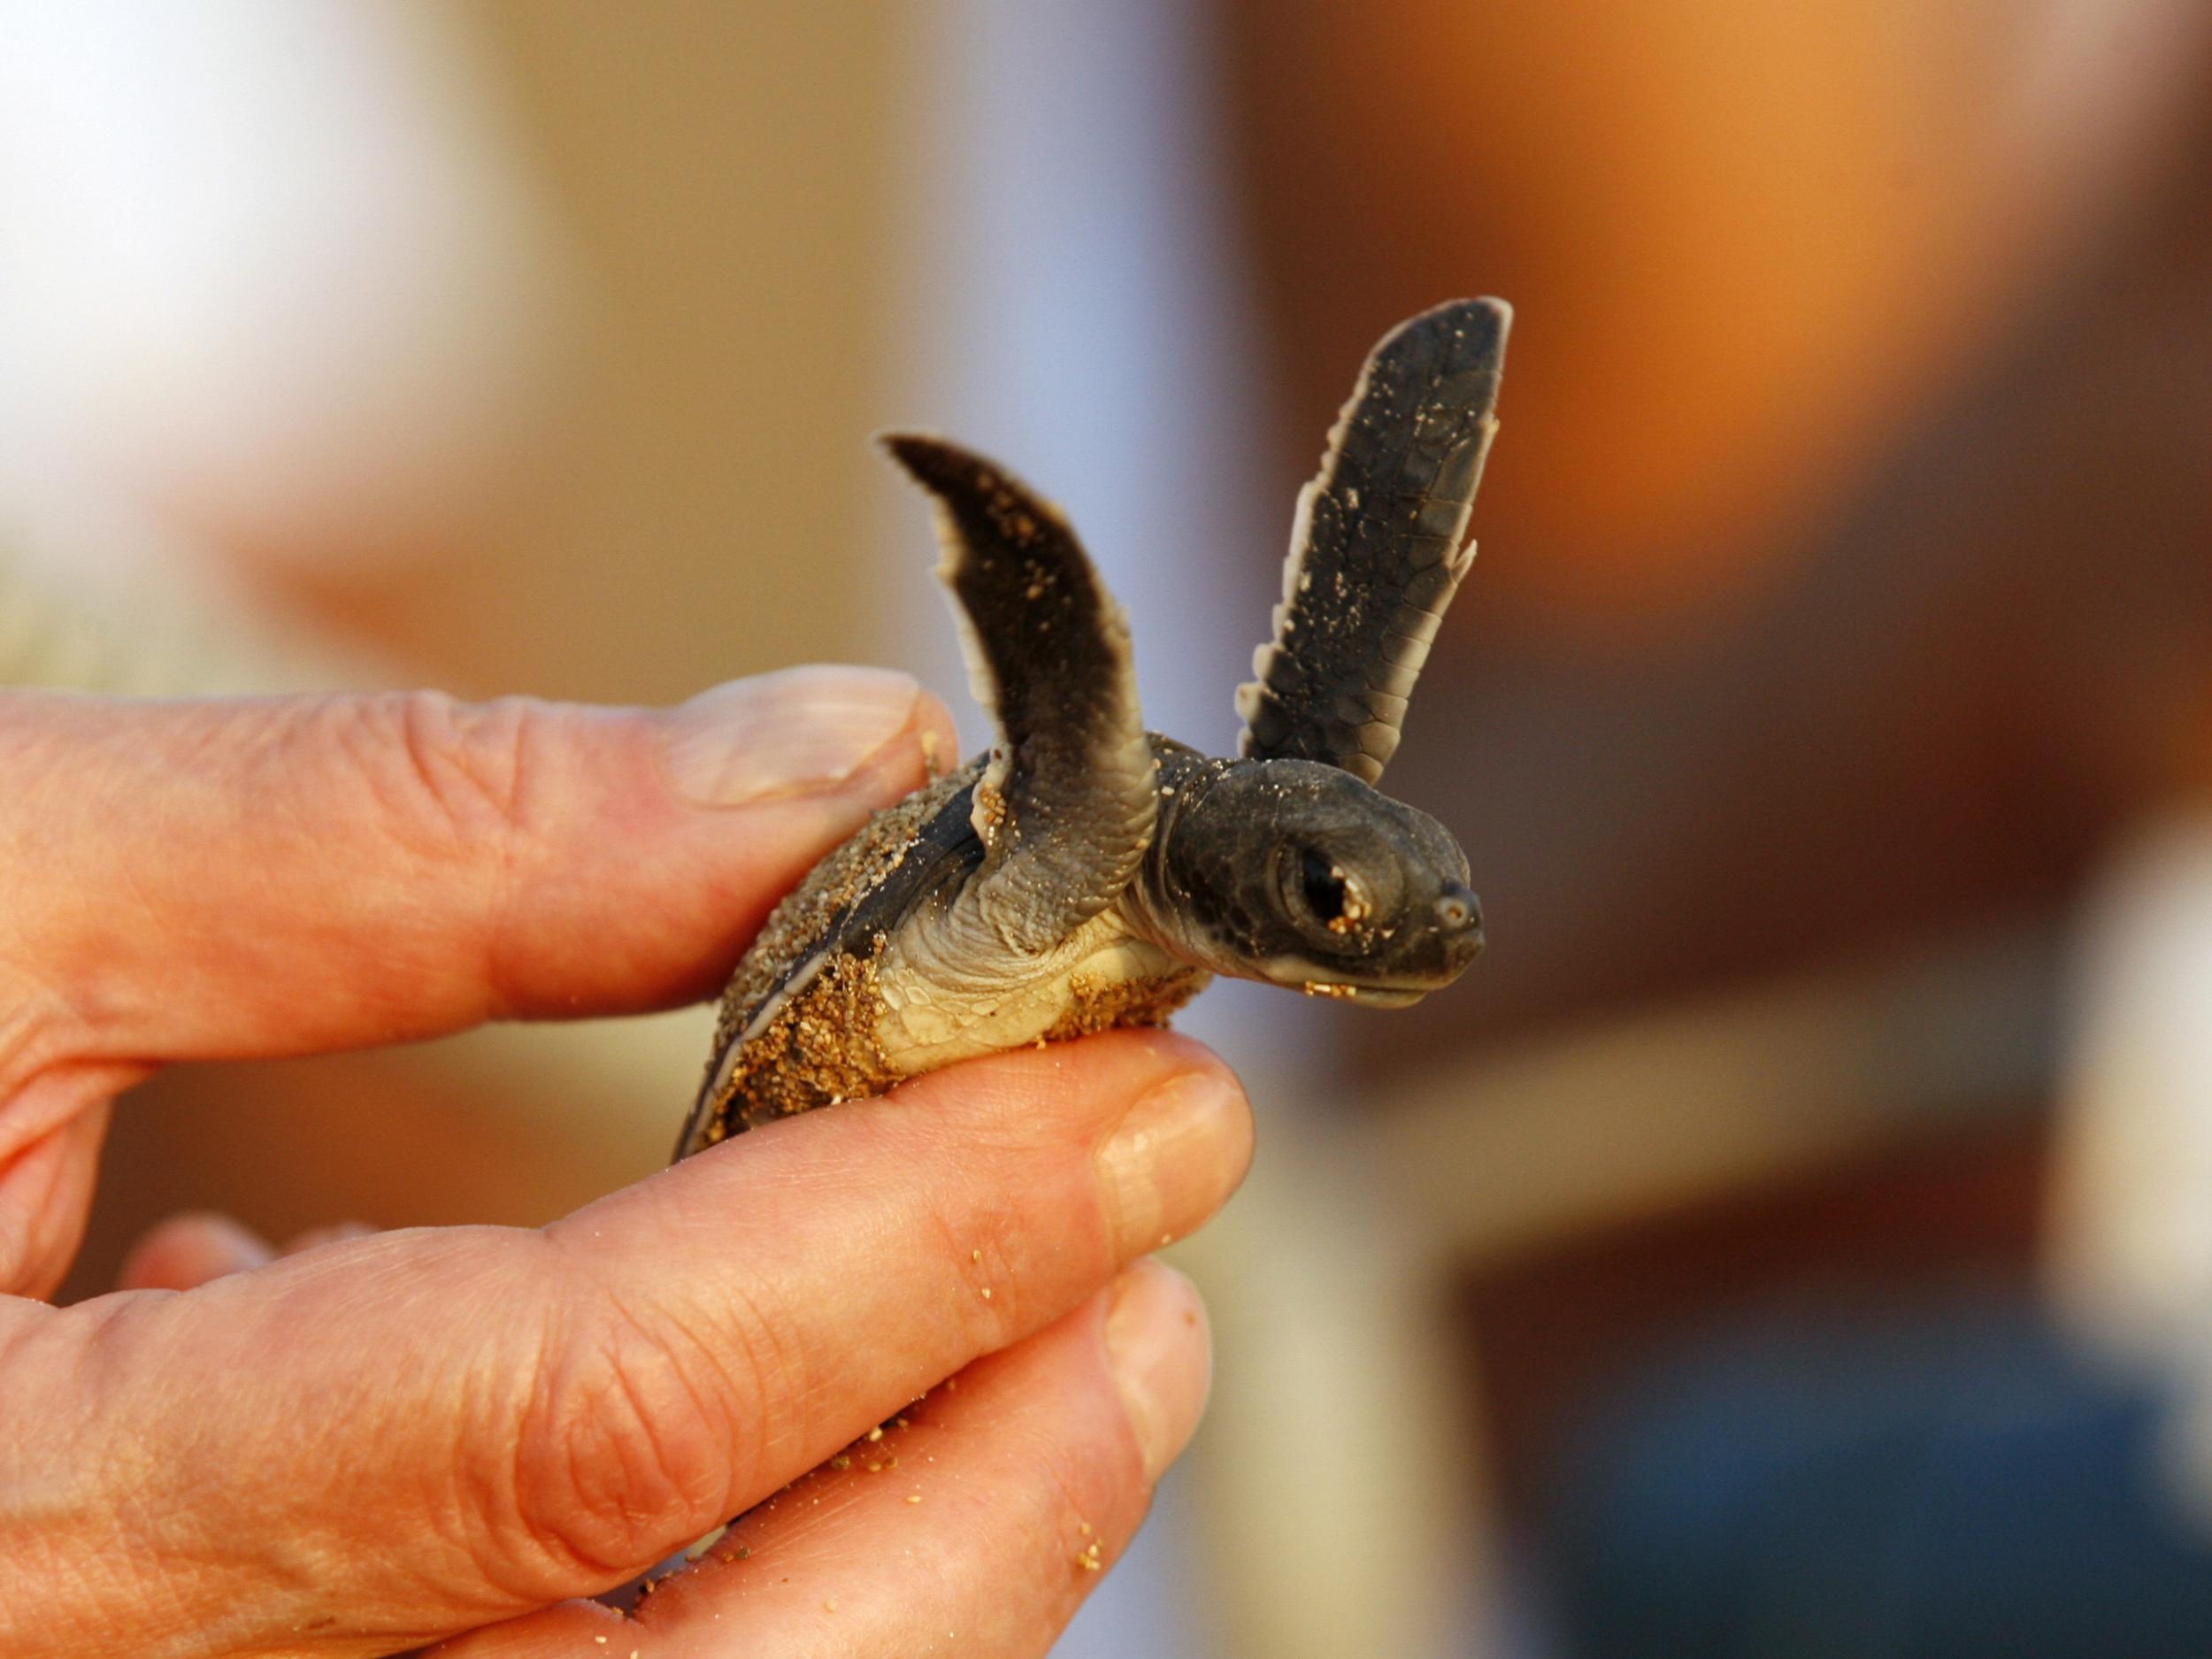 Lifespan of a Turtle